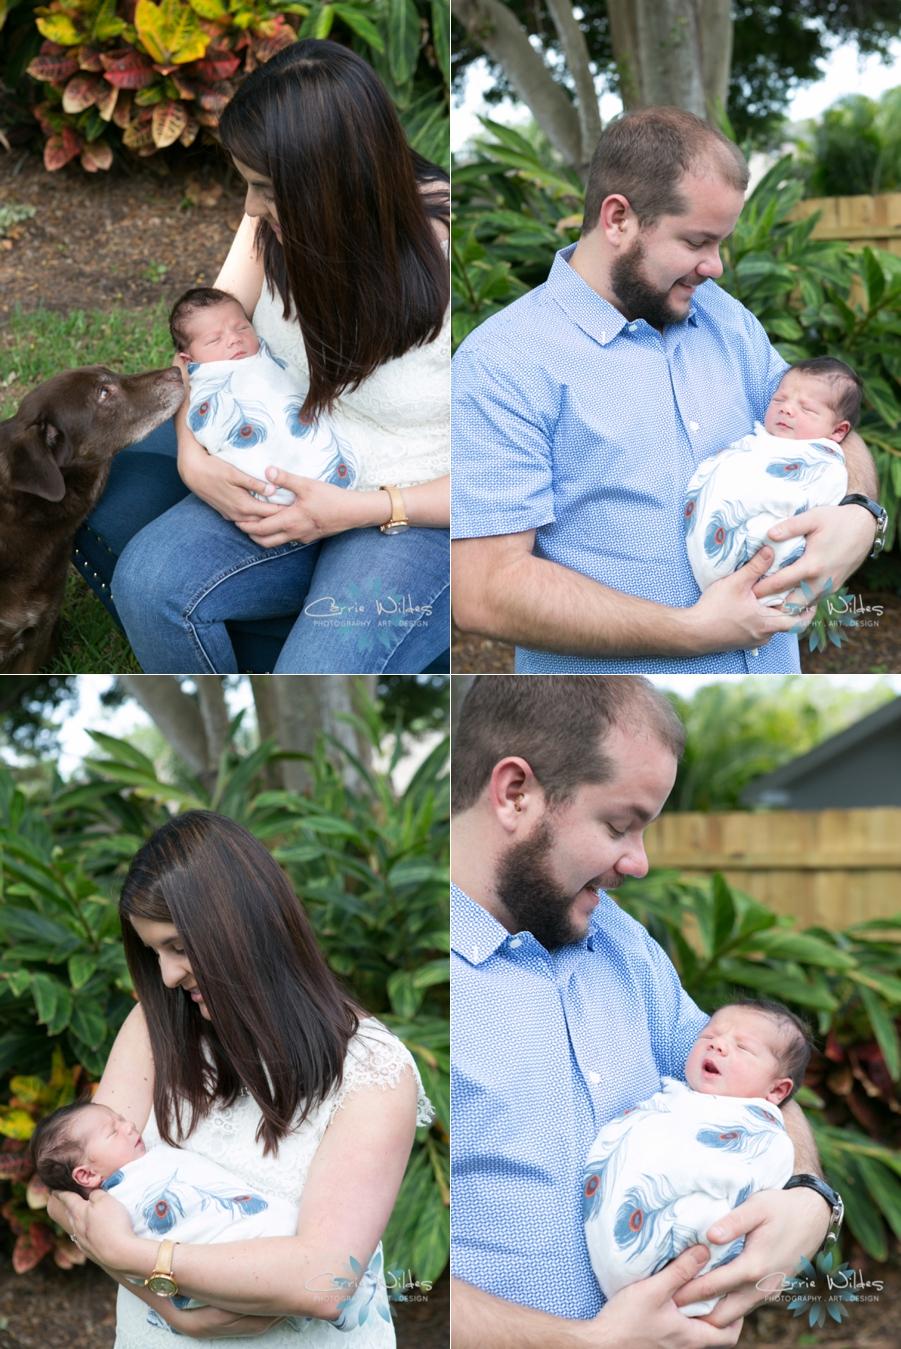 5_10_16 Dax Tampa St Pete Lifestyle Newborn Portraits_0001.jpg